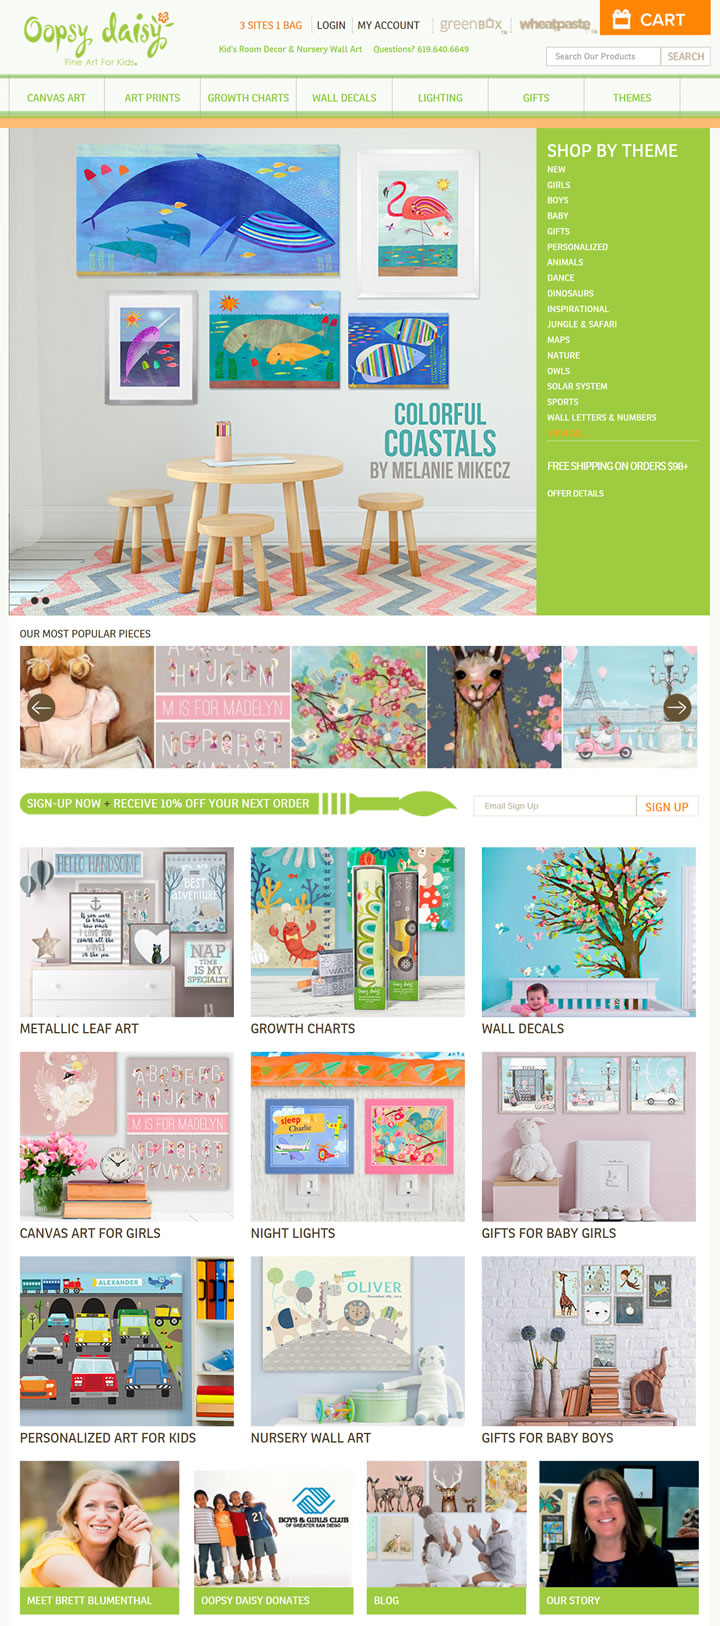 儿童和婴儿艺术墙及房间装饰:Oopsy Daisy